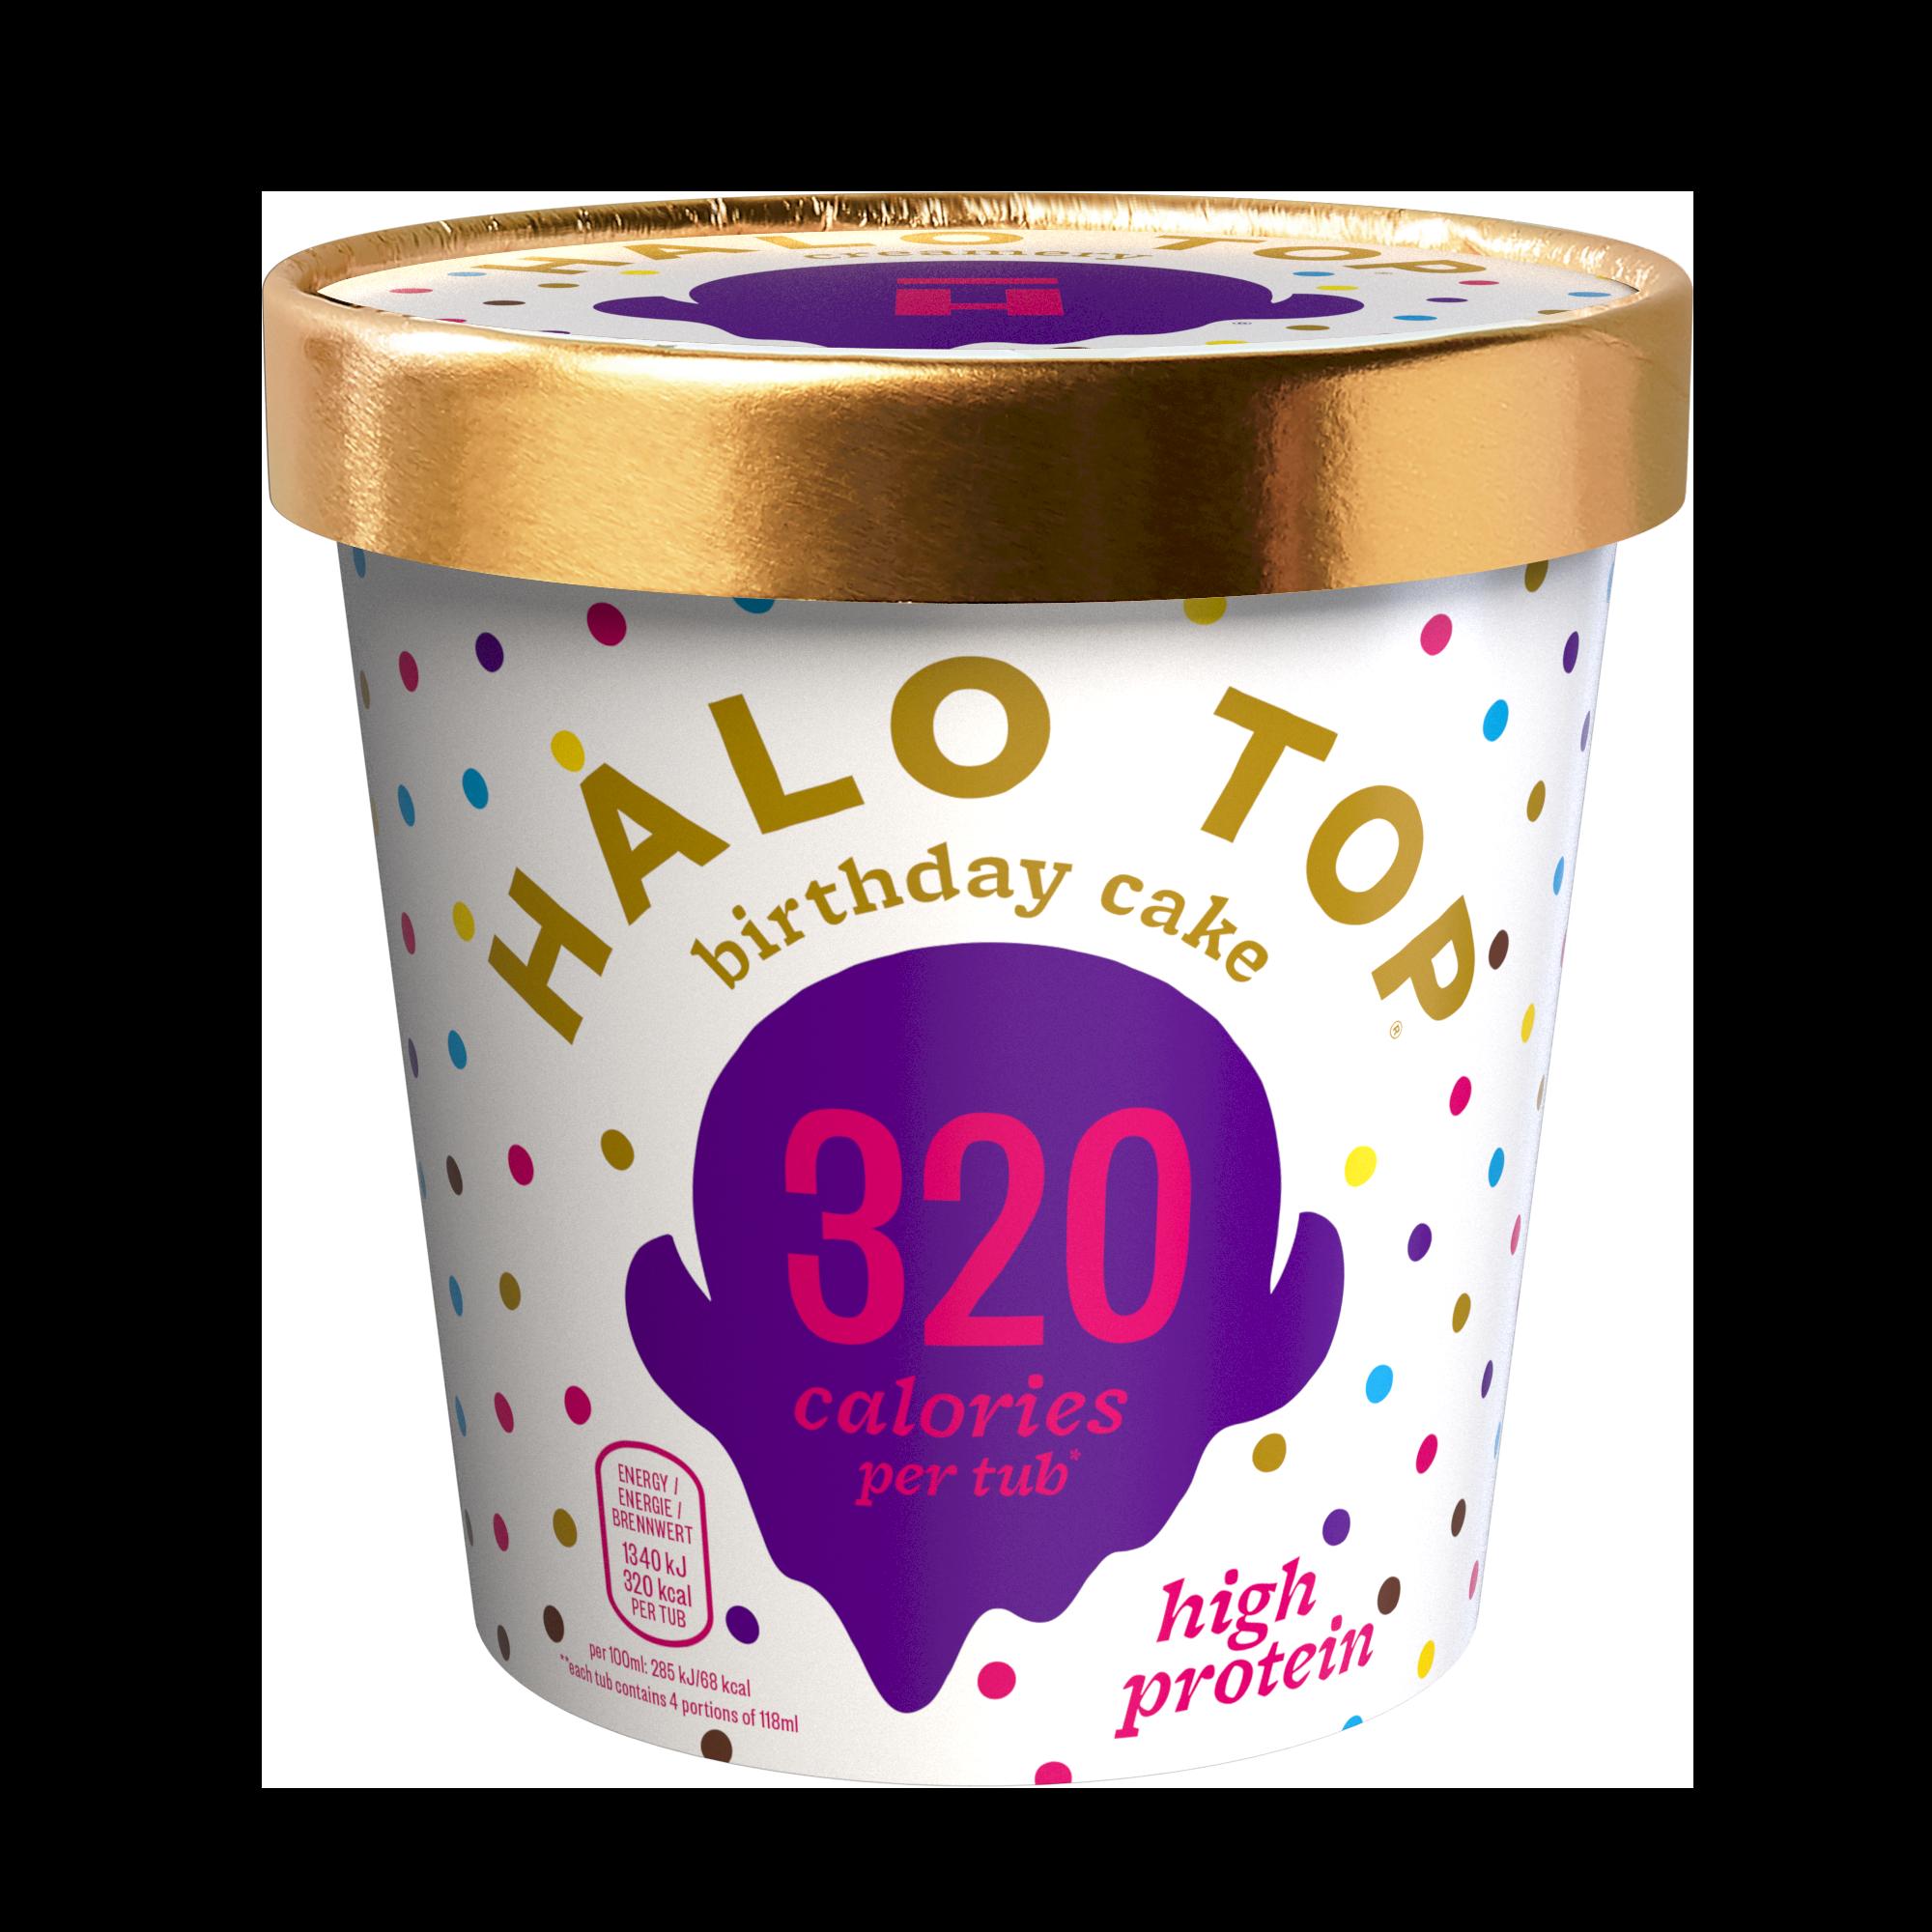 HT18_UK_BirthdayCake_fr_062018-2.png